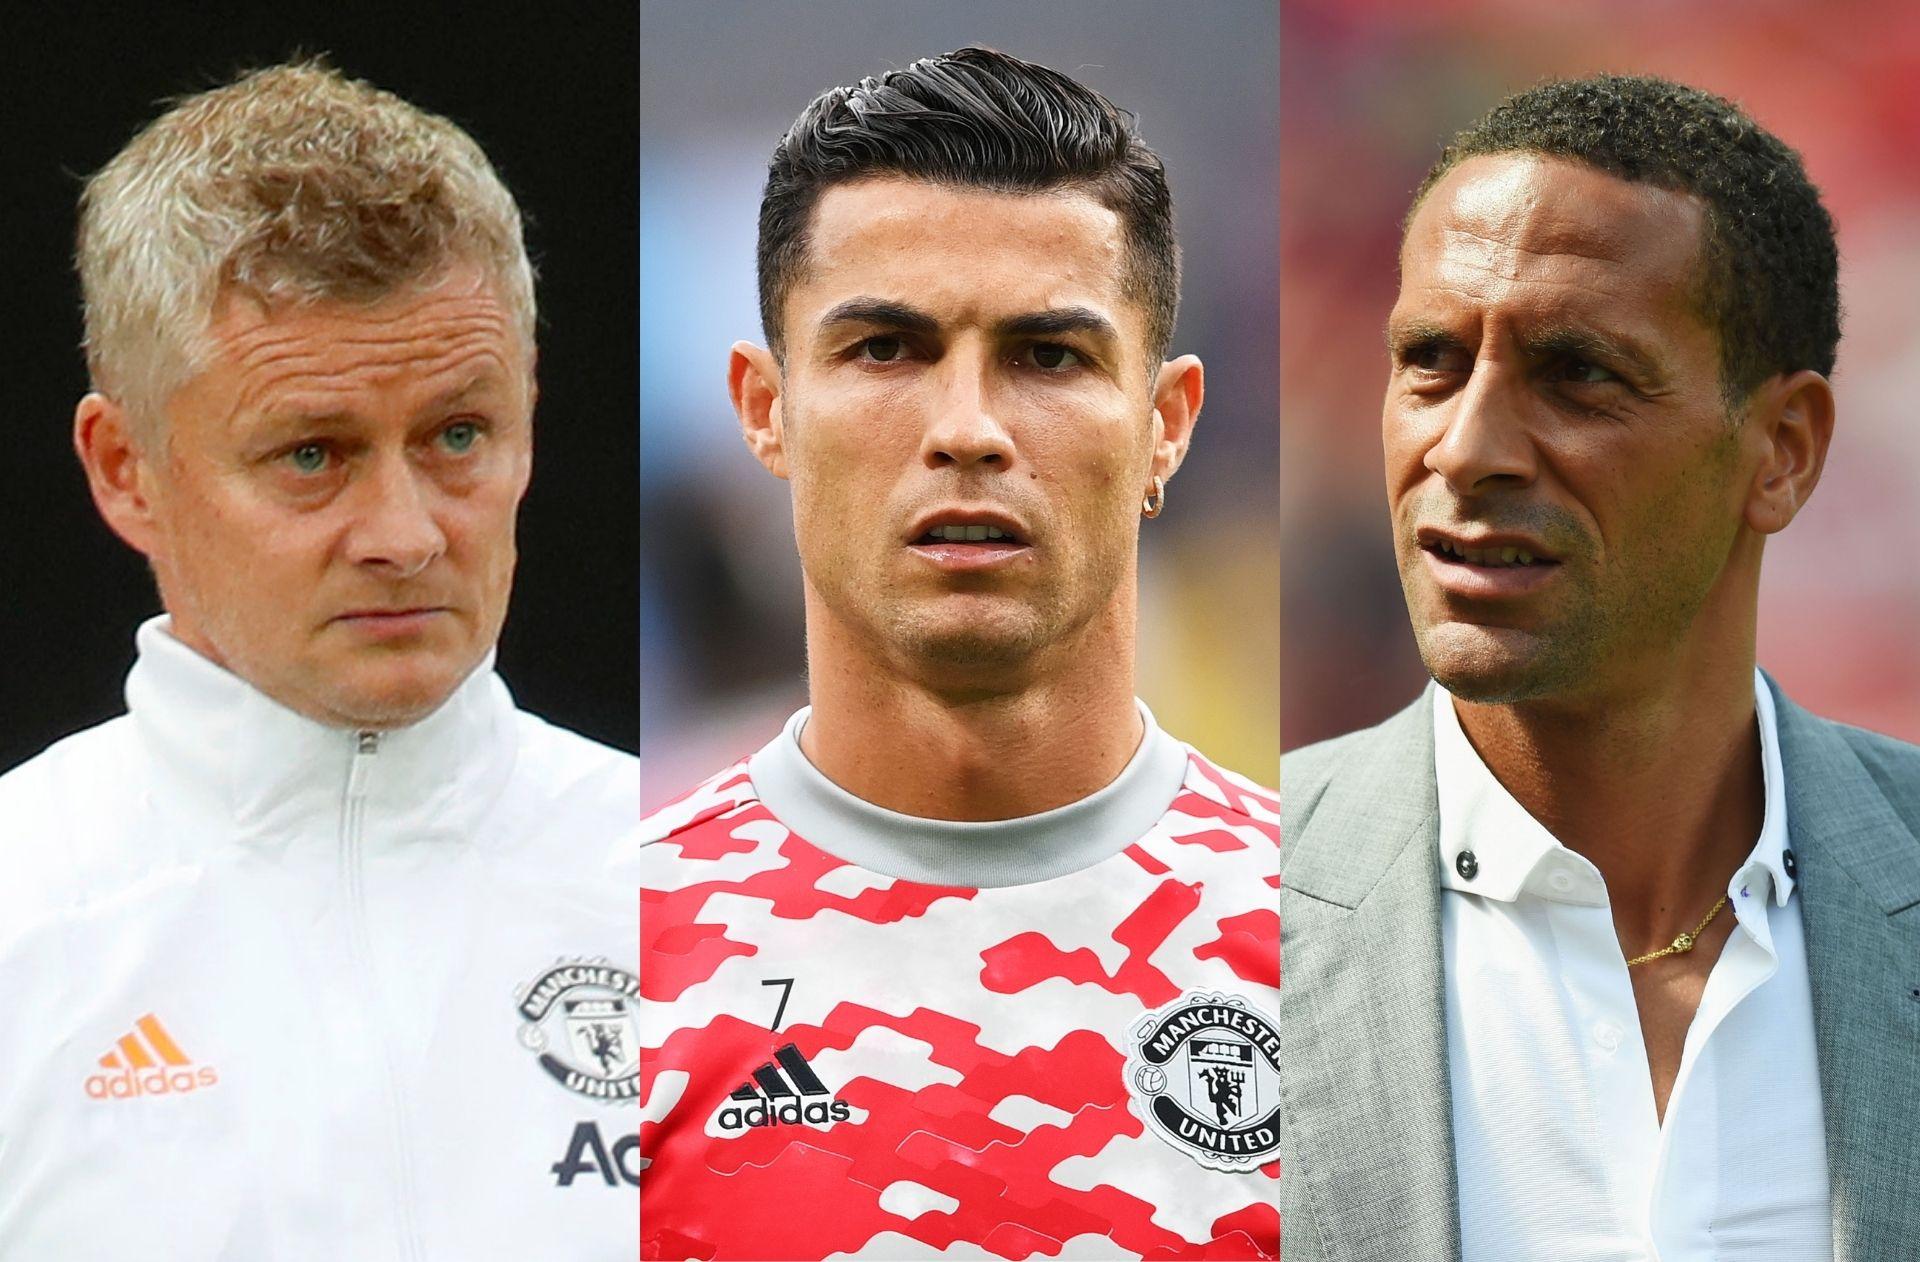 Ole Gunnar Solskjaer, Cristiano Ronaldo, Rio Ferdinand